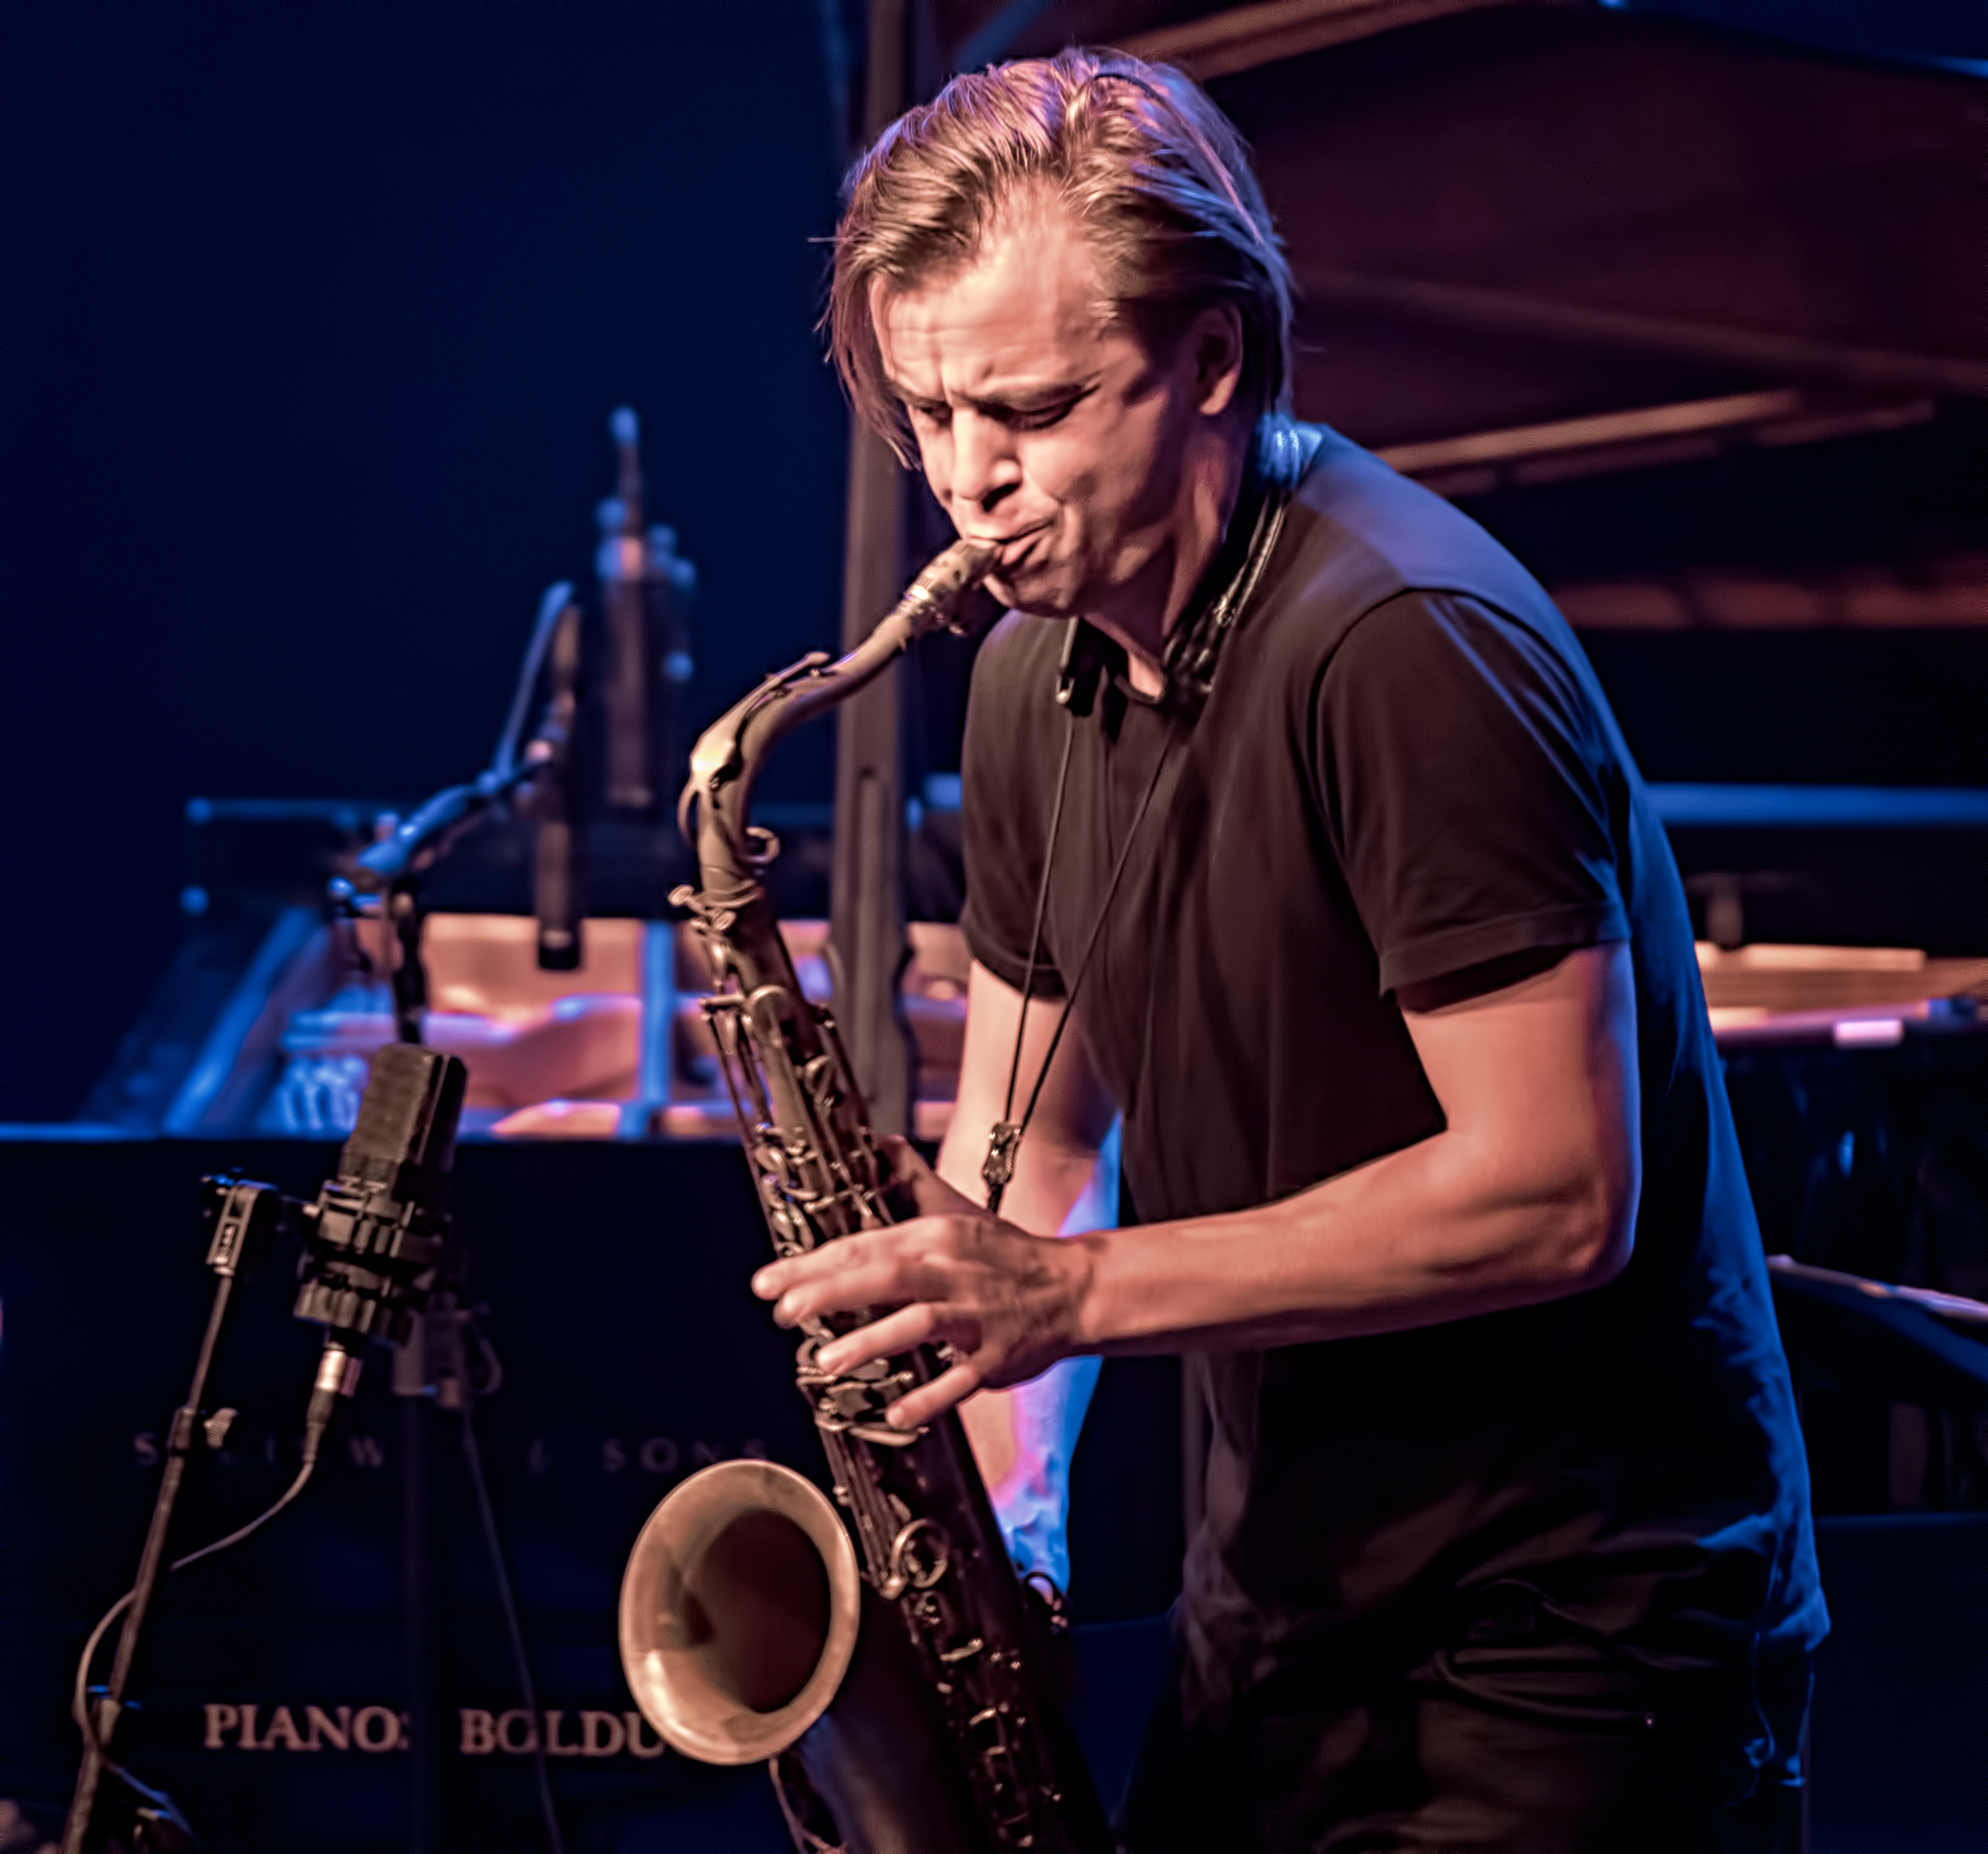 Marius Neset At The Montreal International Jazz Festival 2018